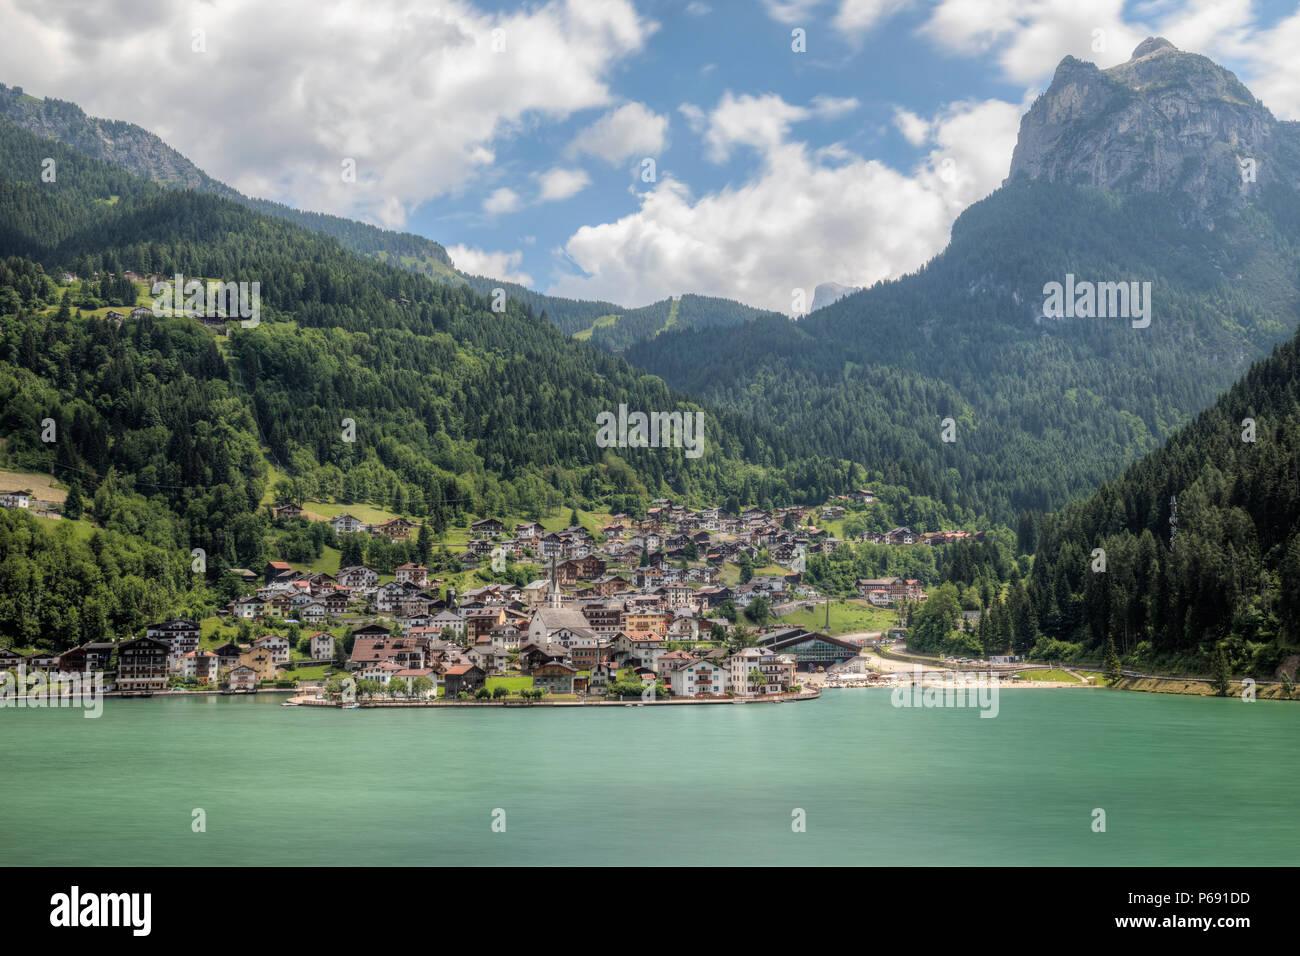 Alleghe, Belluno, Dolomites, Veneto, Italy, Europe - Stock Image